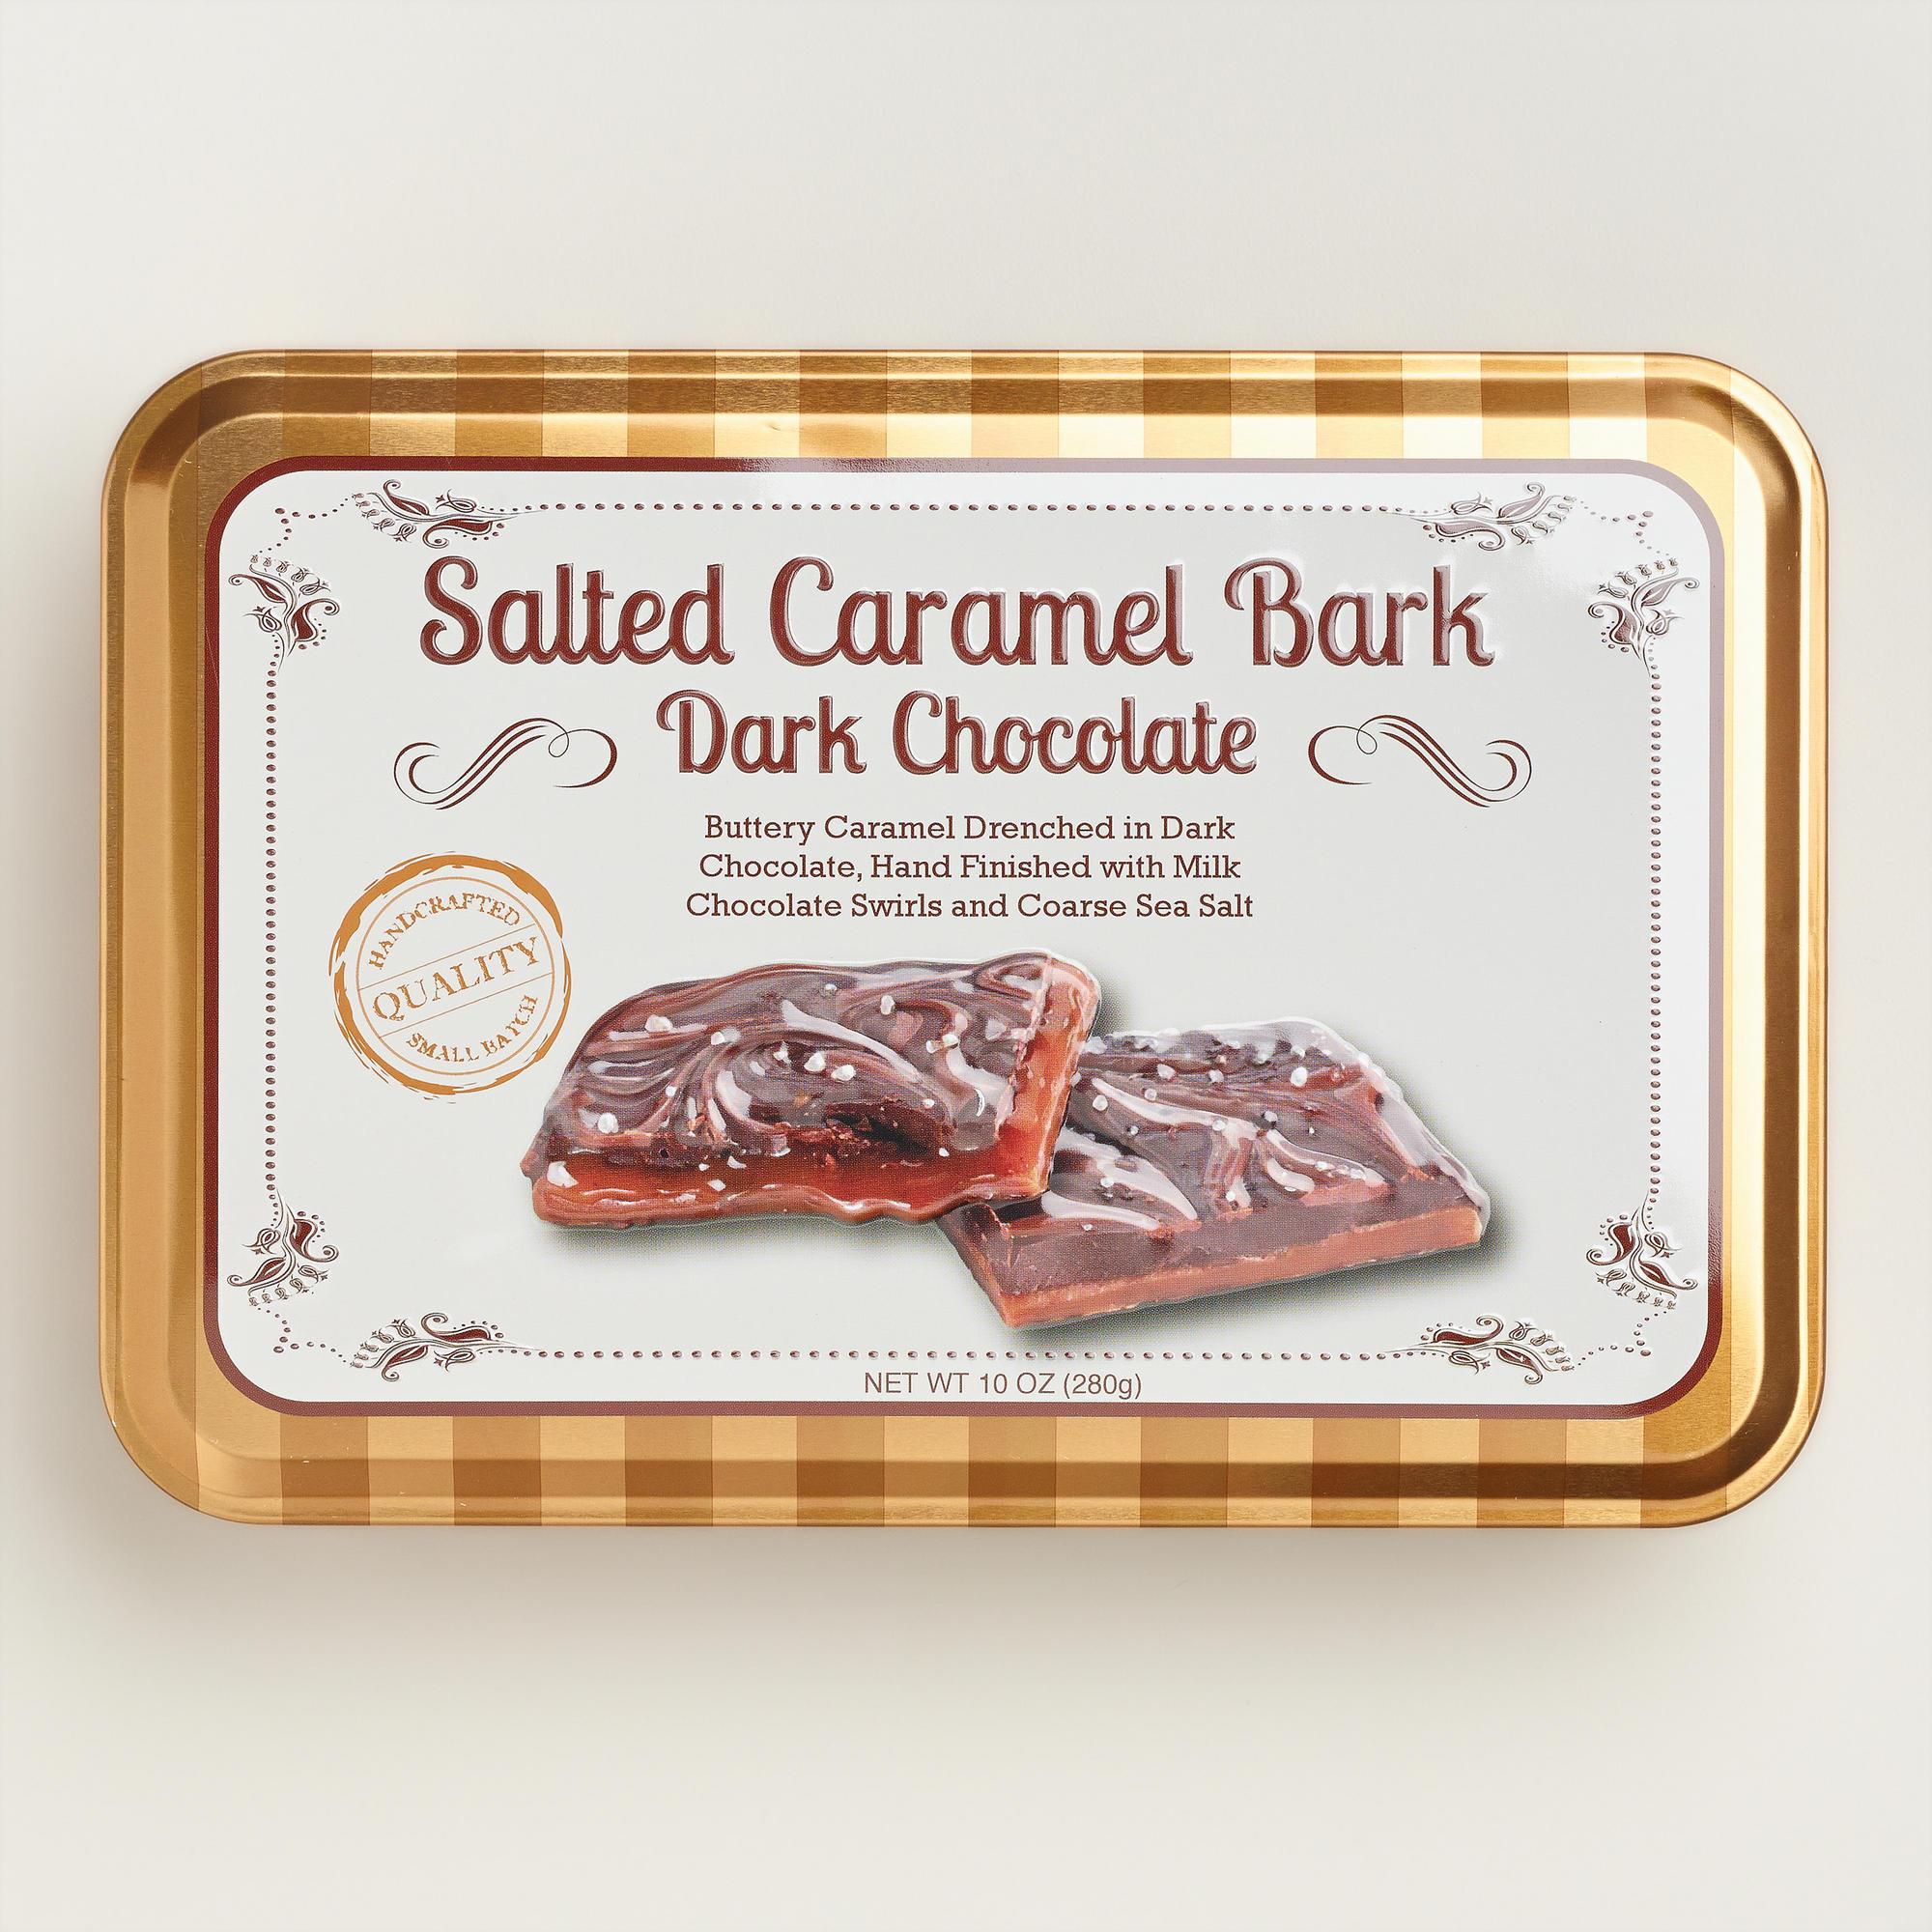 Salted Caramel Dark Chocolate Bark